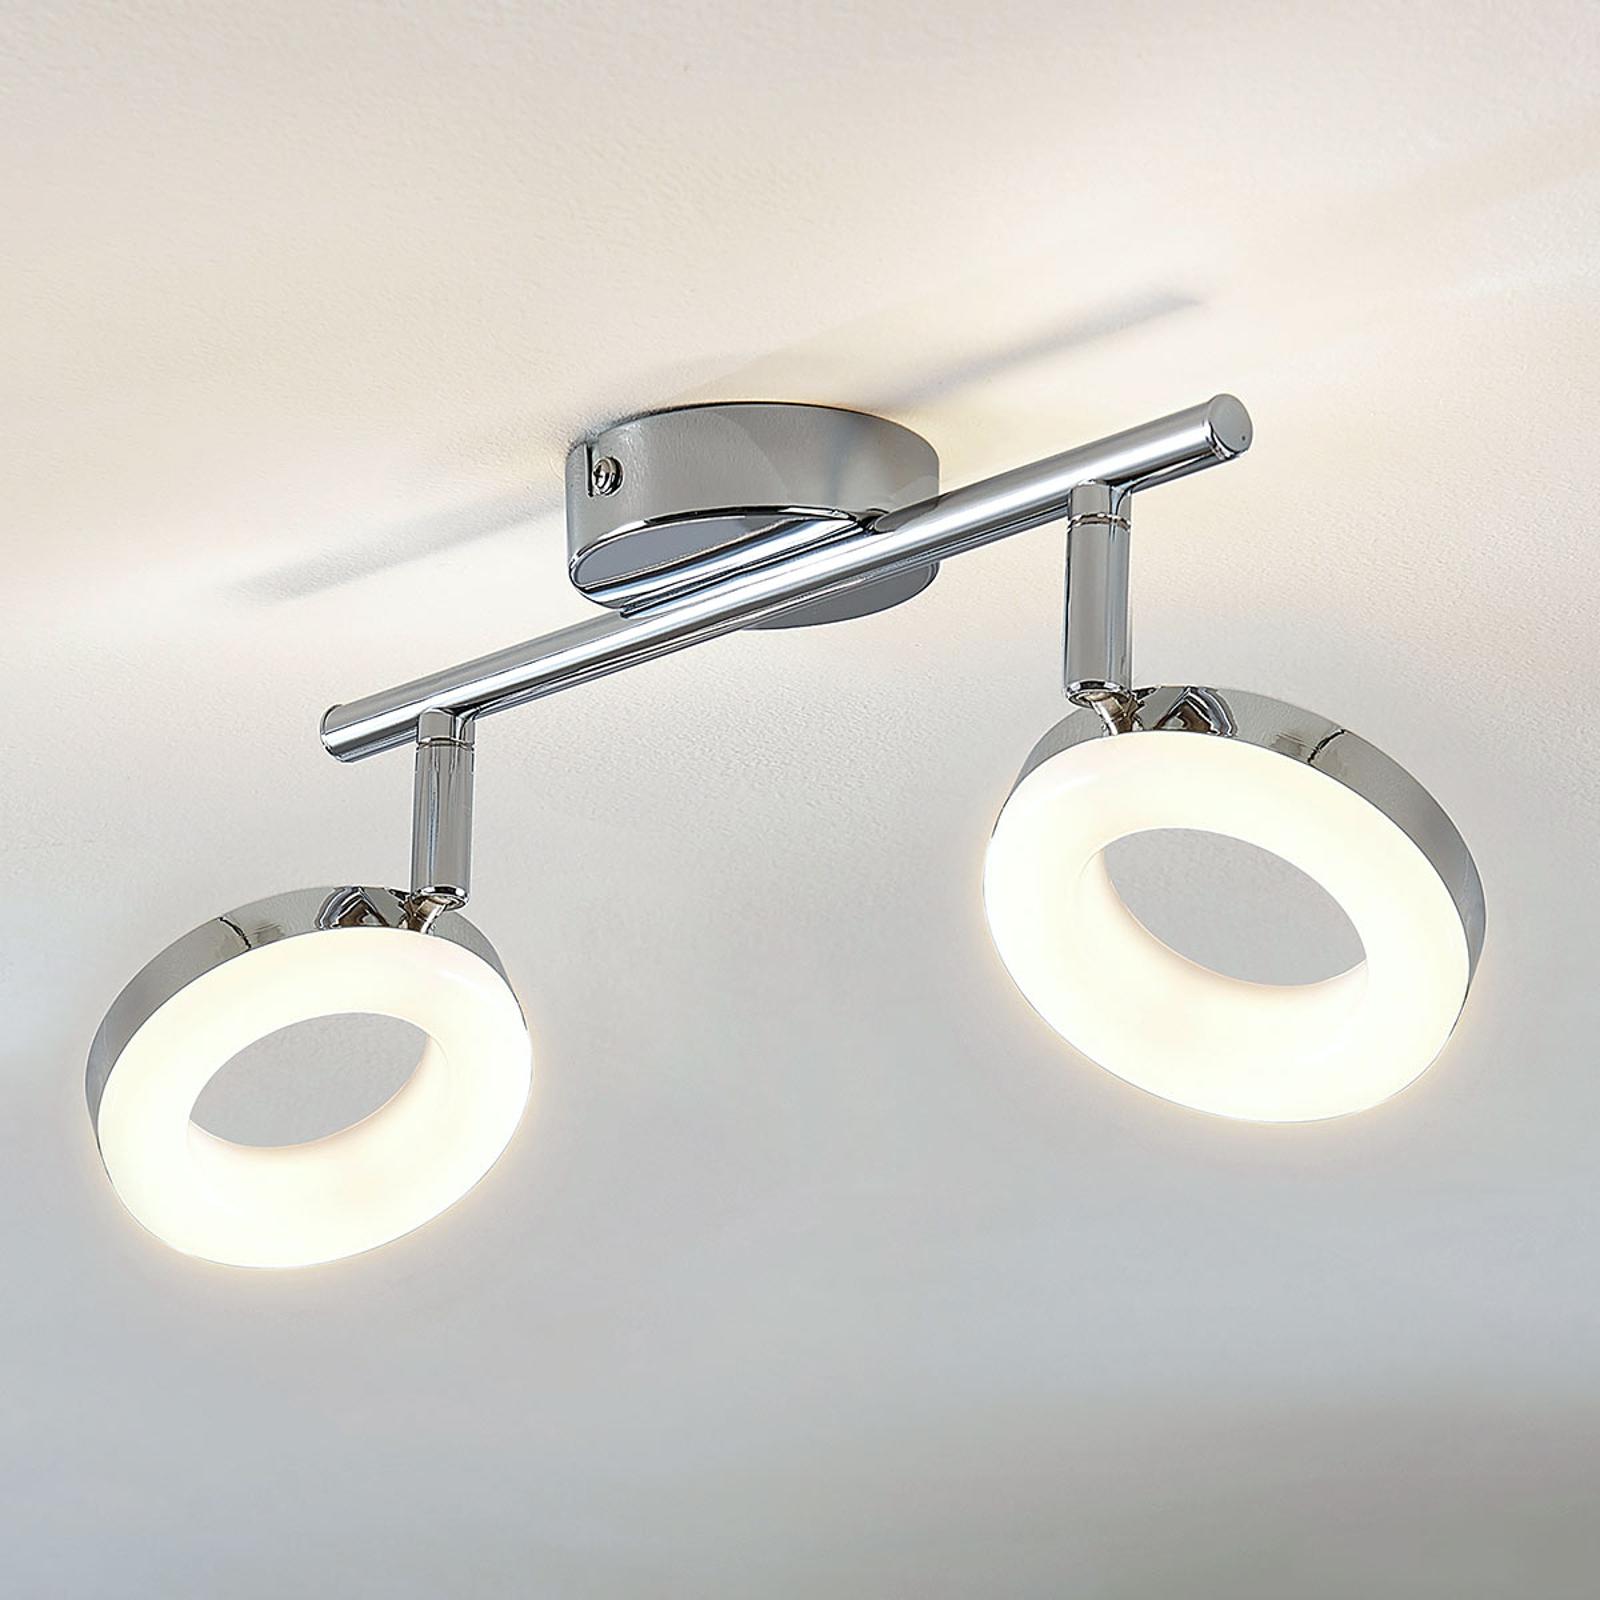 Lampa sufitowa LED Ringo 2-punktowa